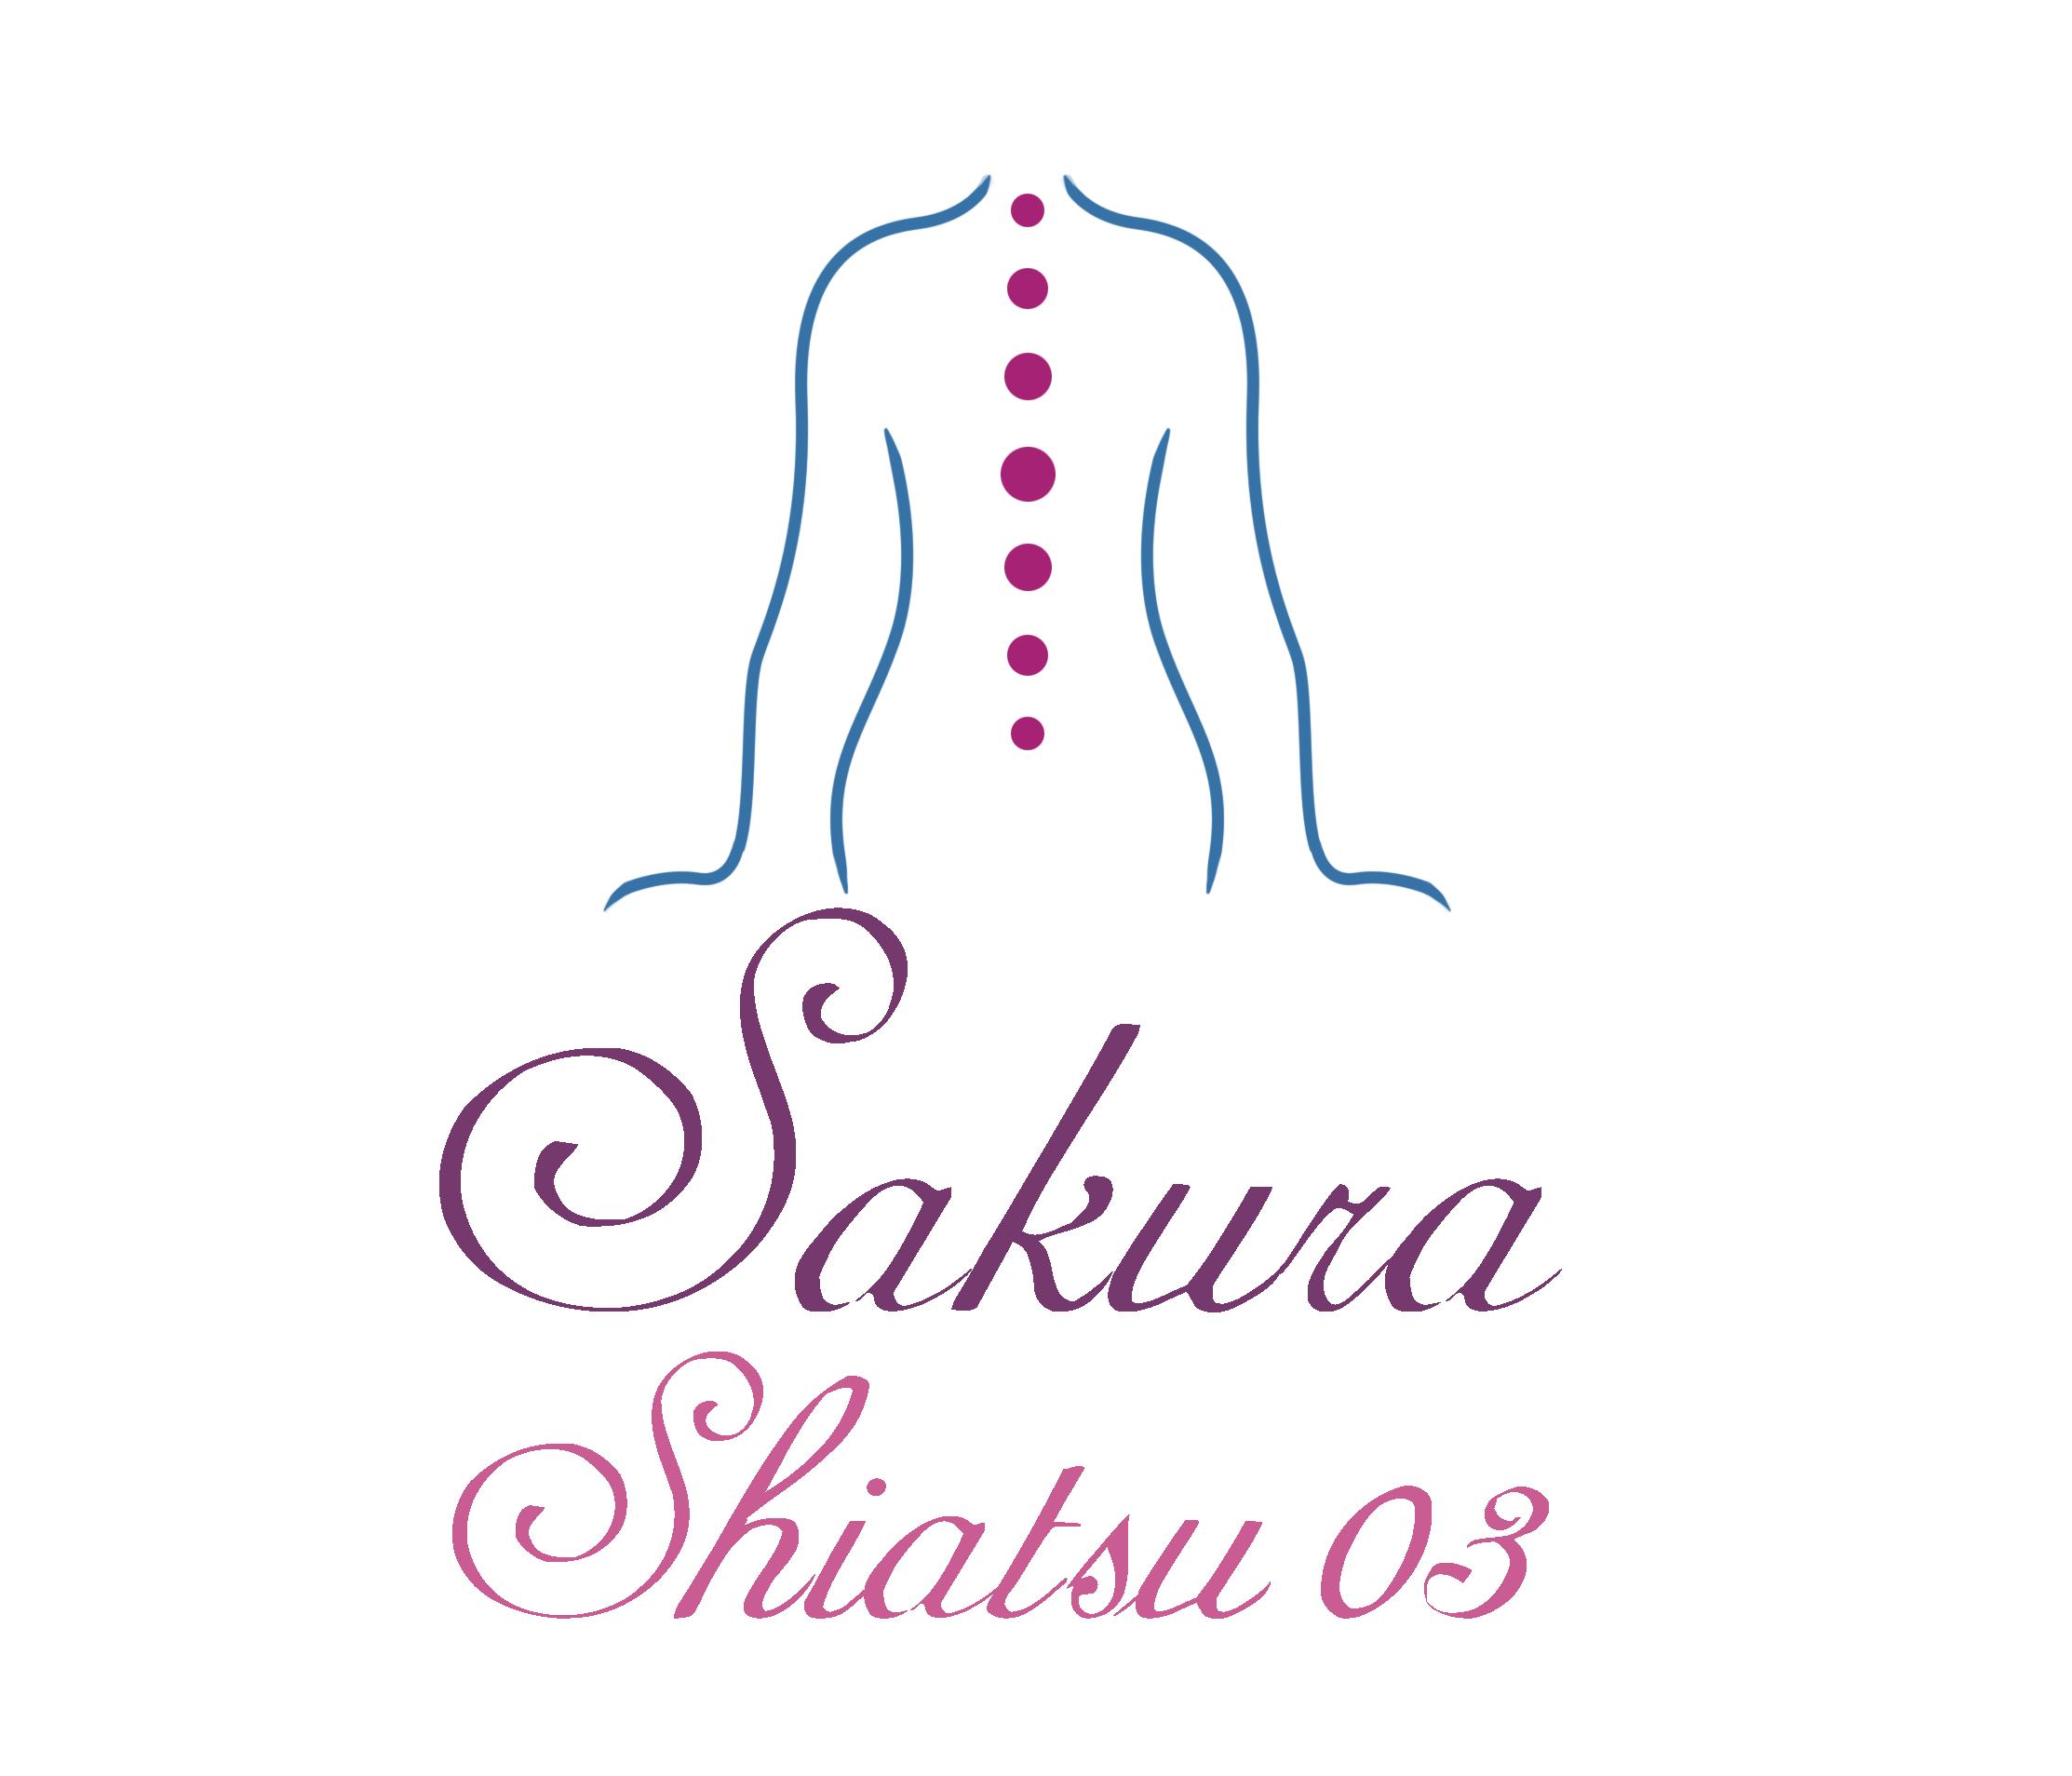 Sakura - Shiatsu 03 : infos, localisation, contacts... pour ce centre de shiatsu